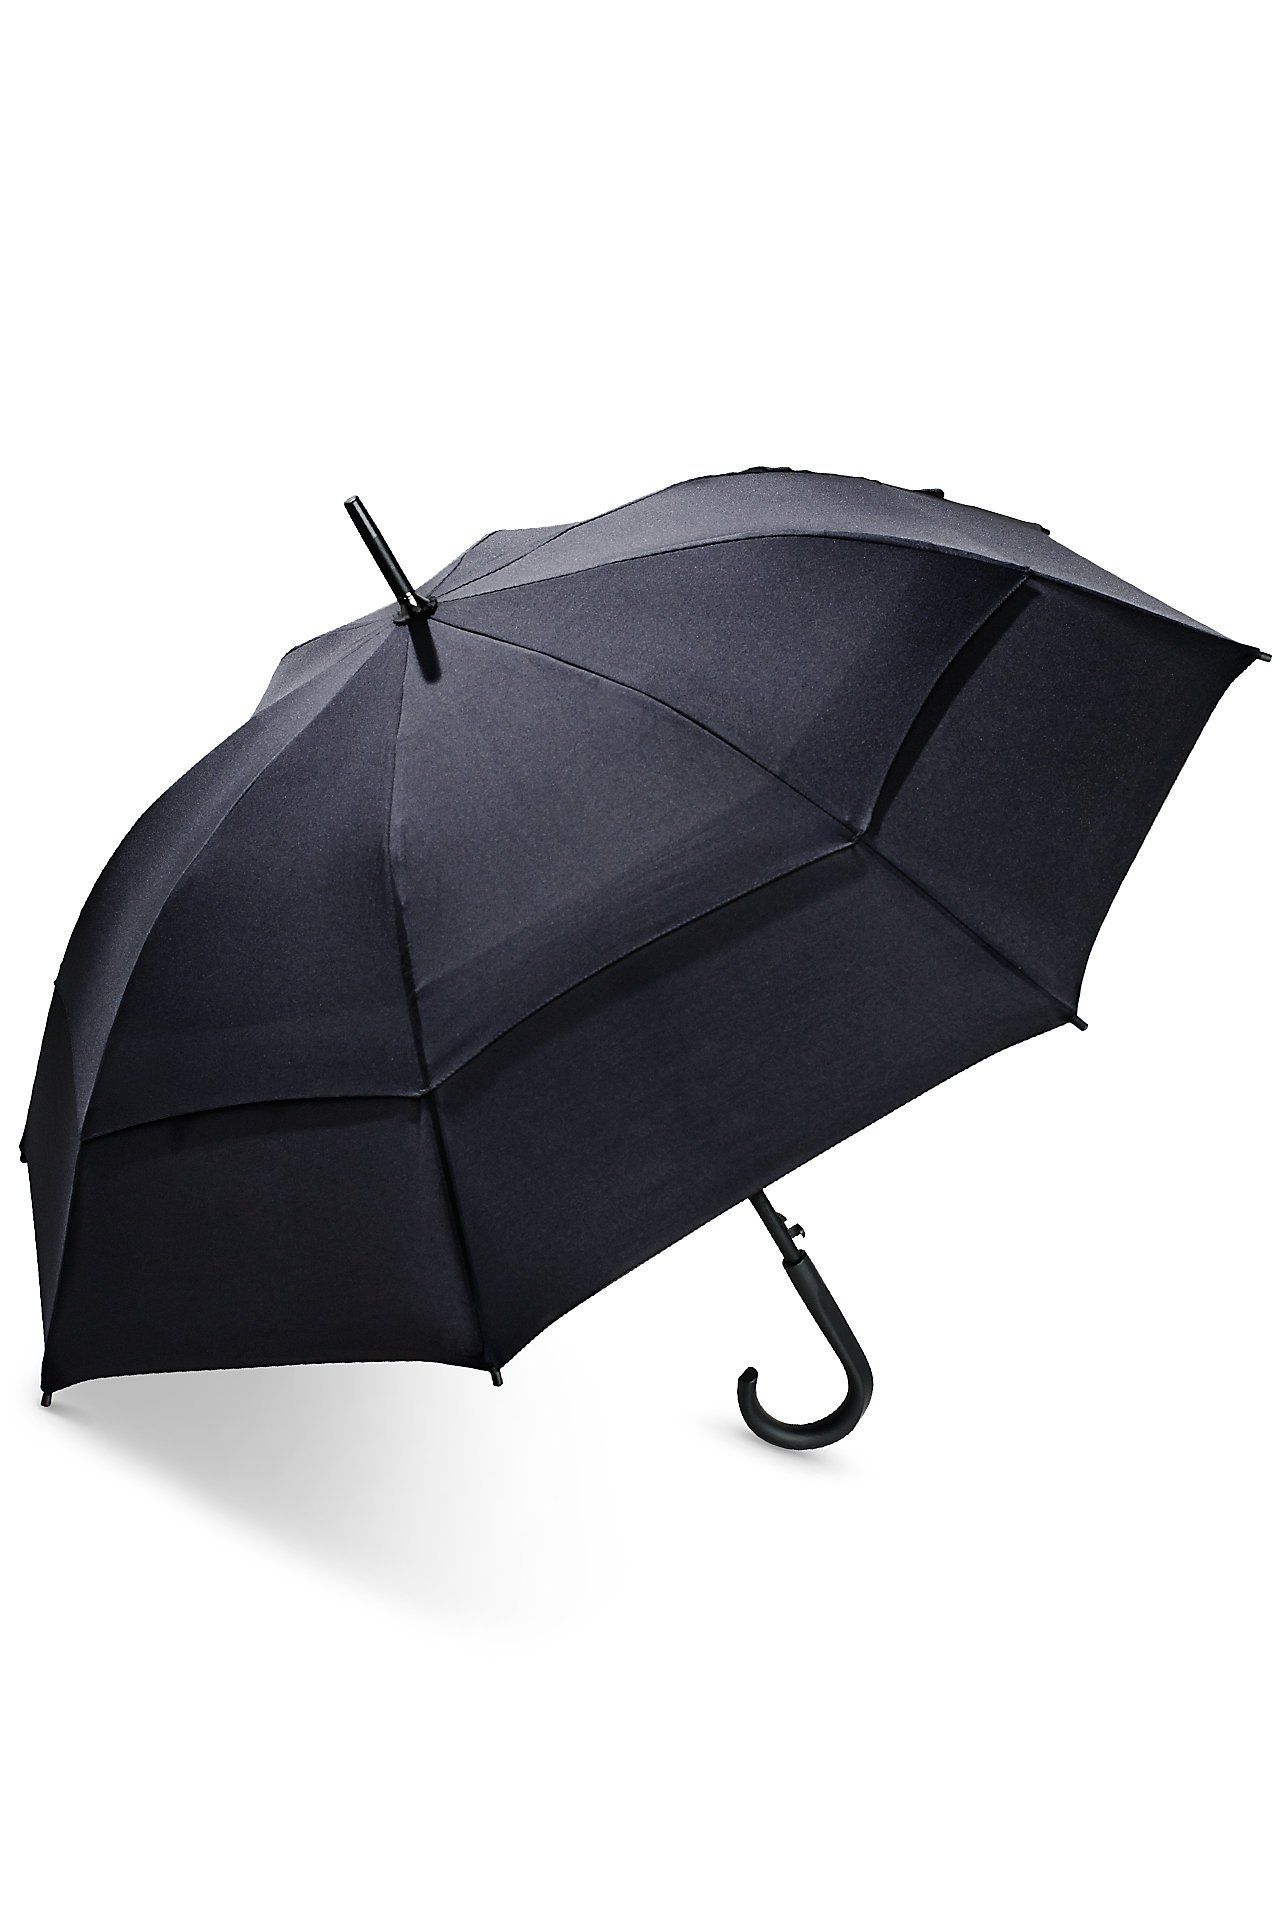 Coolibar UPF 50+ 48'' Titanium Fashion Umbrella - Sun Protective (One Size- Black)